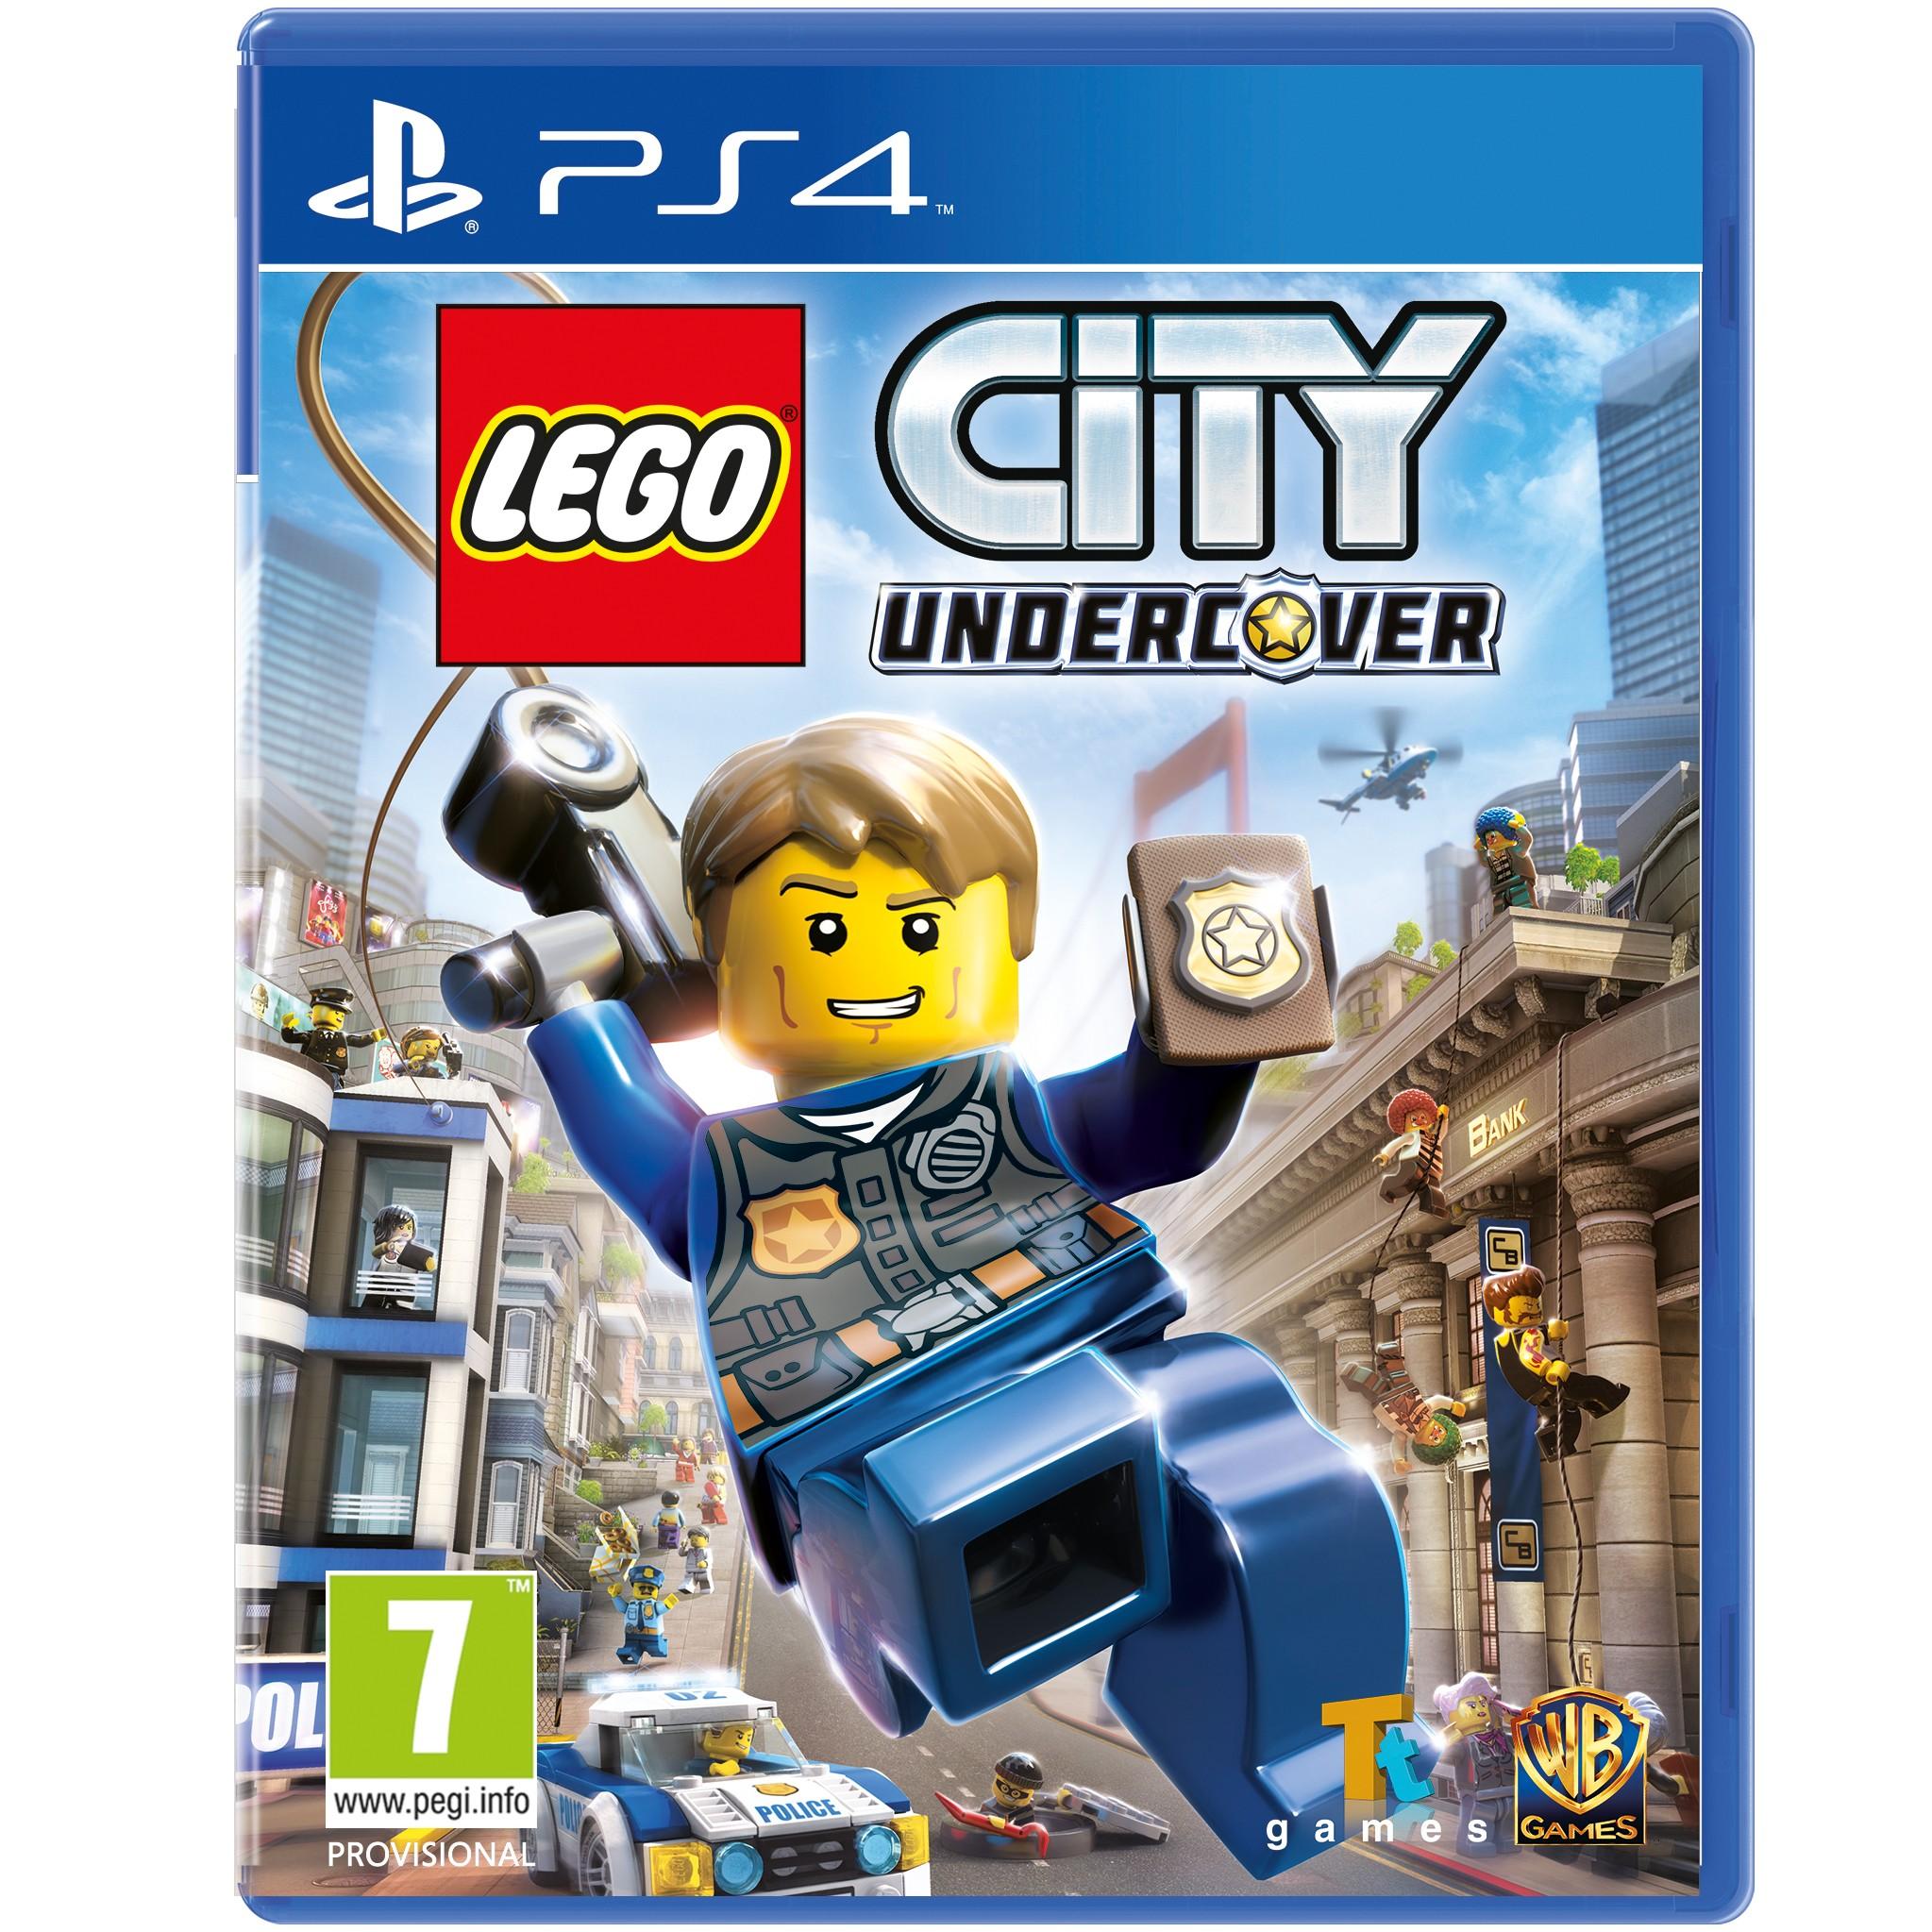 PS4LEGOCUND : LEGO City Undercover (PS4)